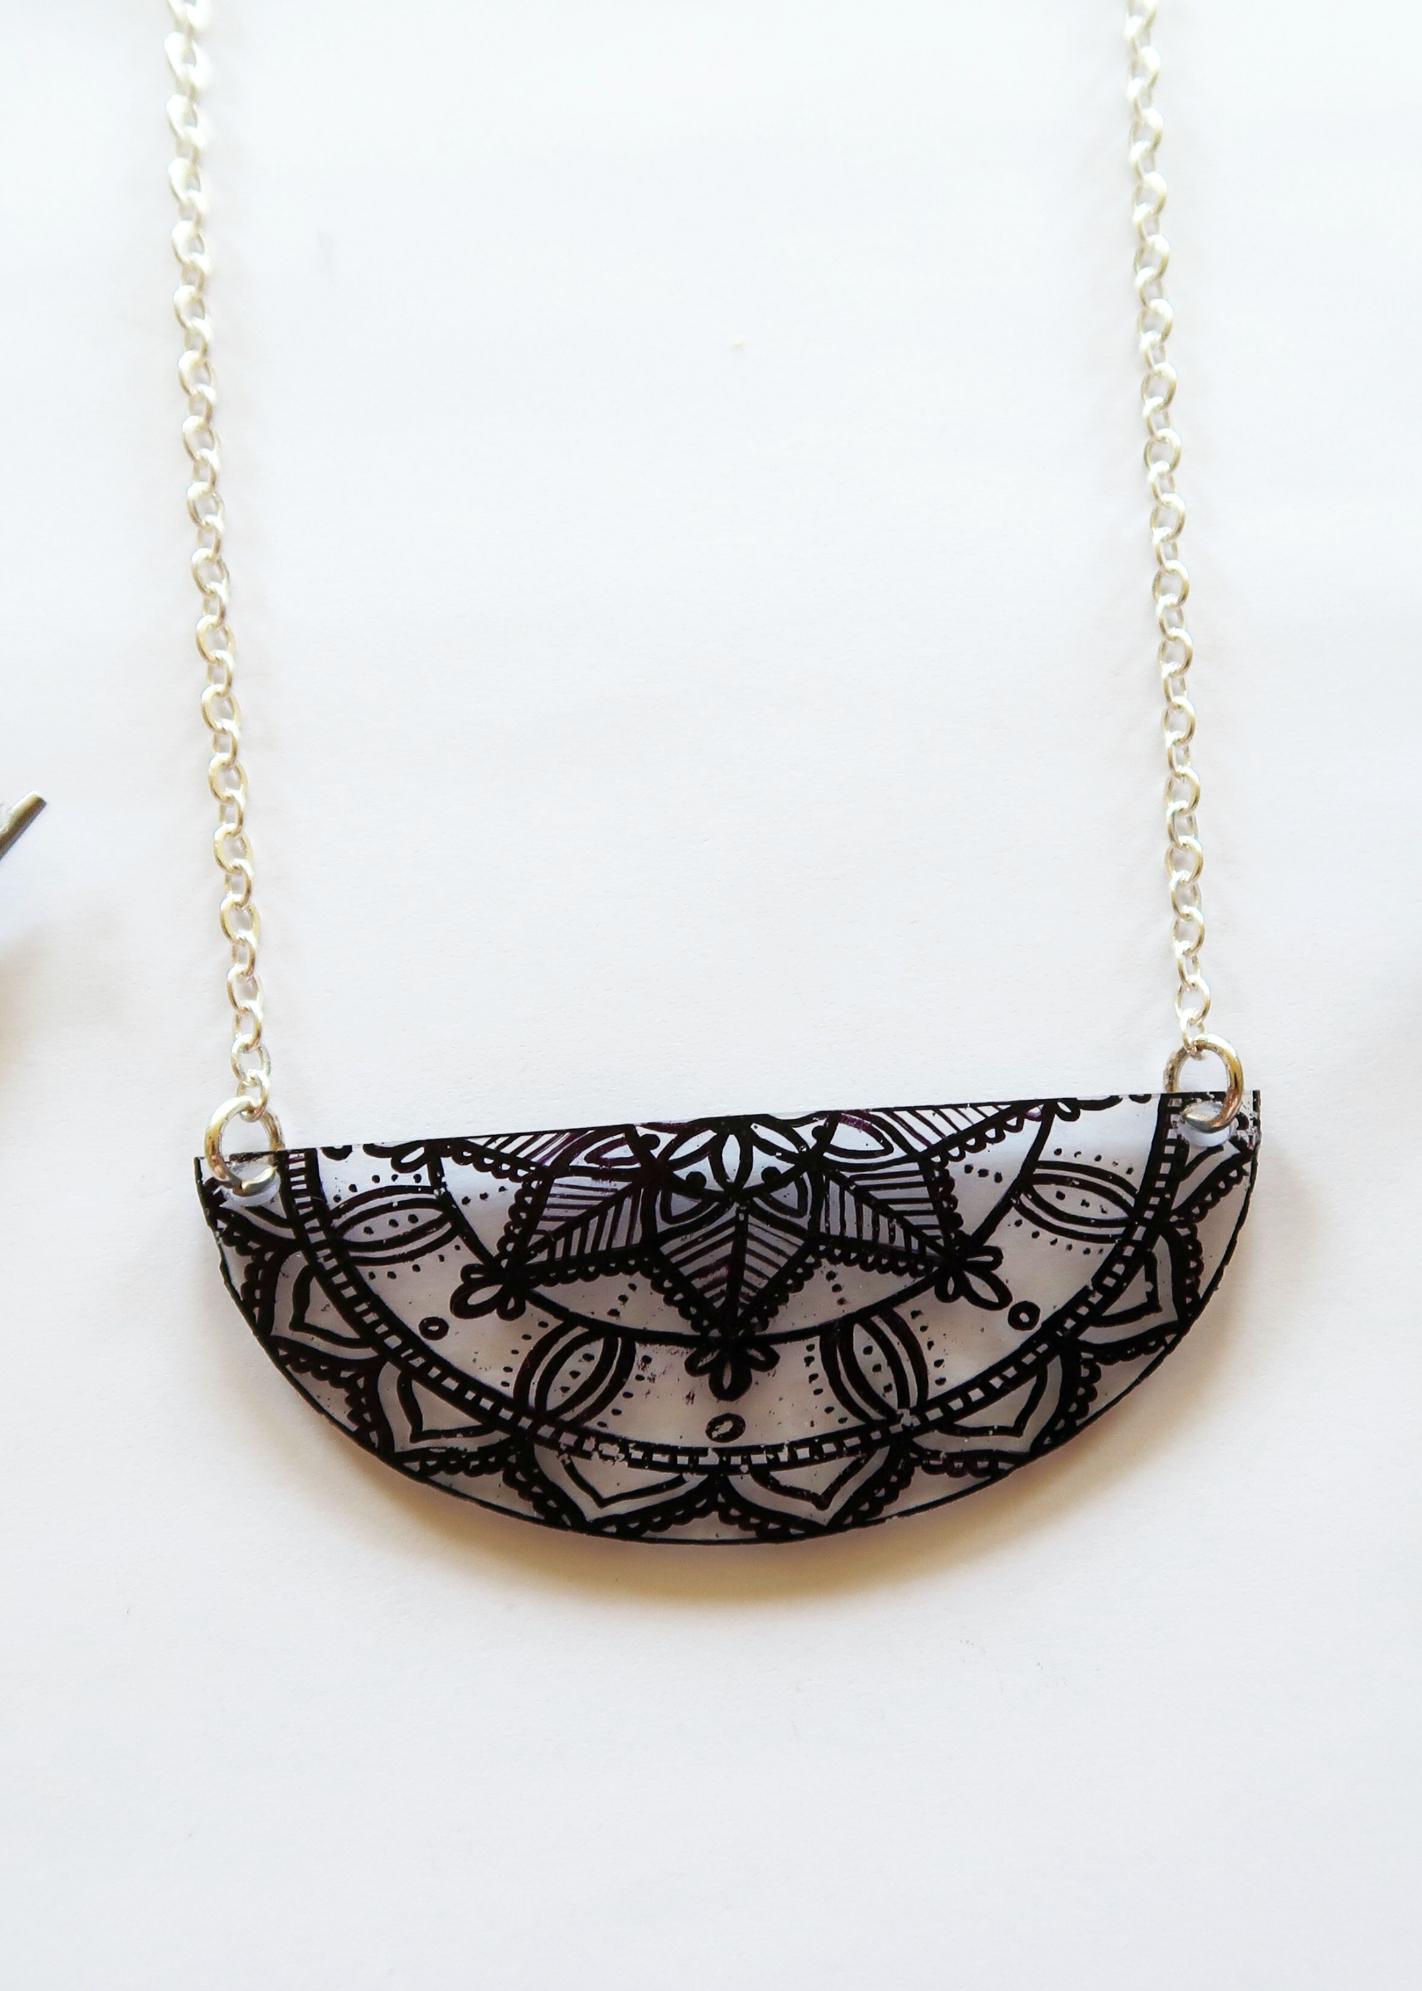 DIY Plastic Mandala Necklace by Isoscella